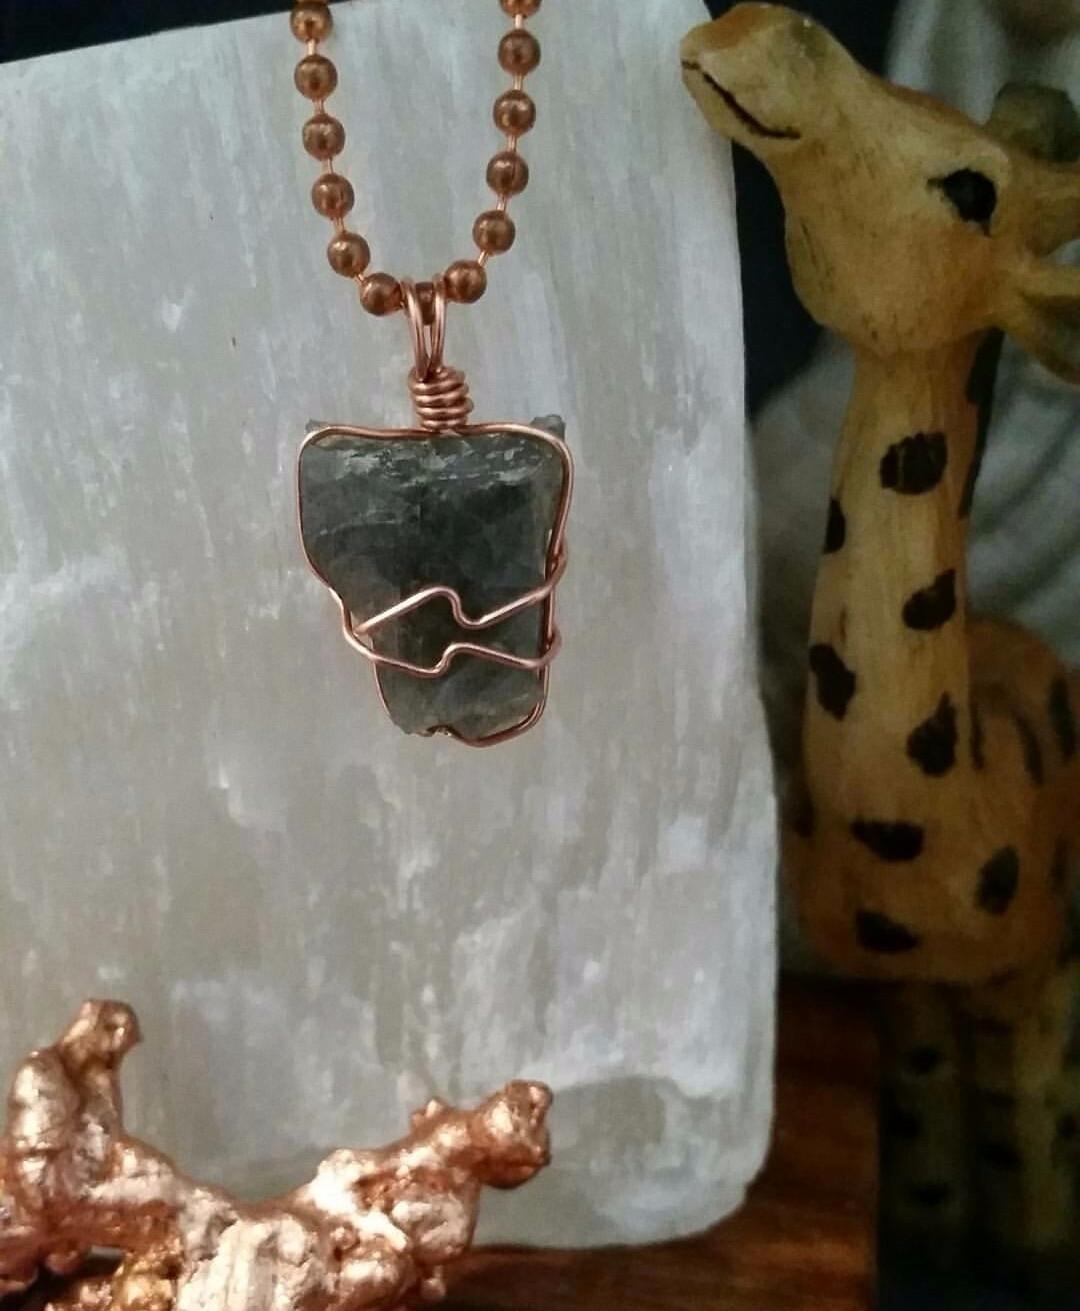 Labradorite stone transformatio - elevatingvibrations | ello